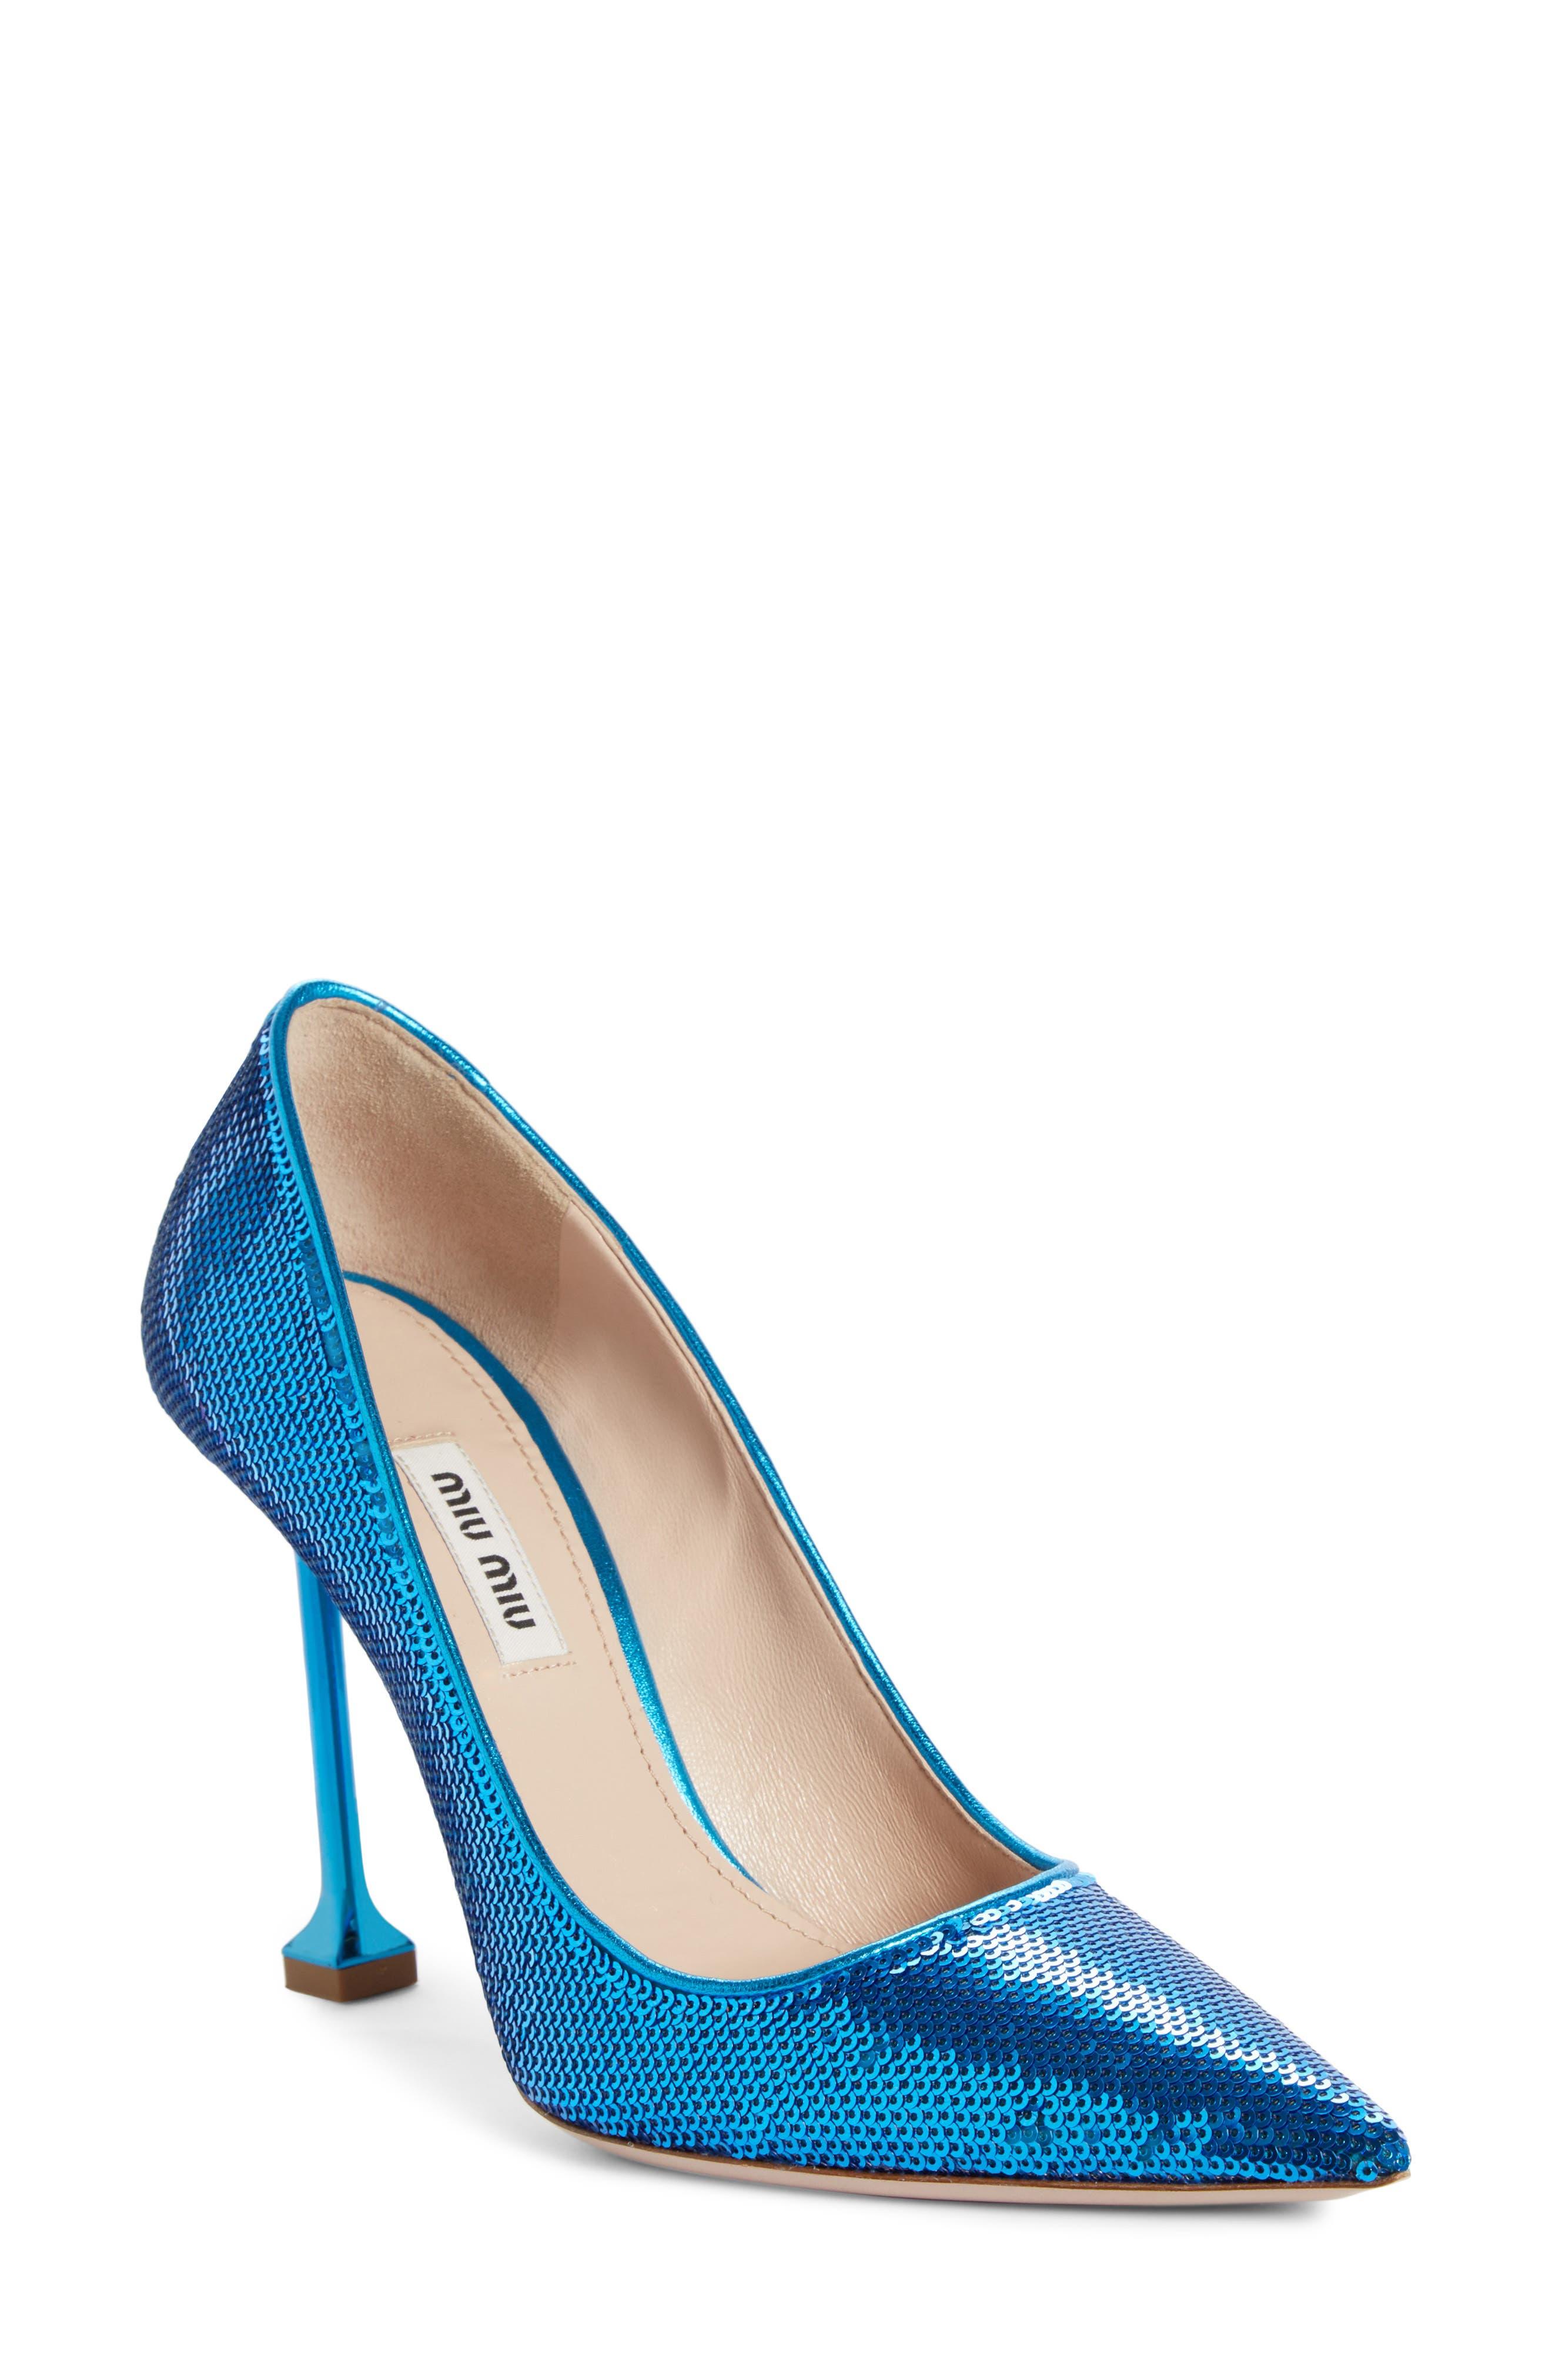 Sequin Pin Heel Pump,                             Main thumbnail 1, color,                             MAREA BLUE